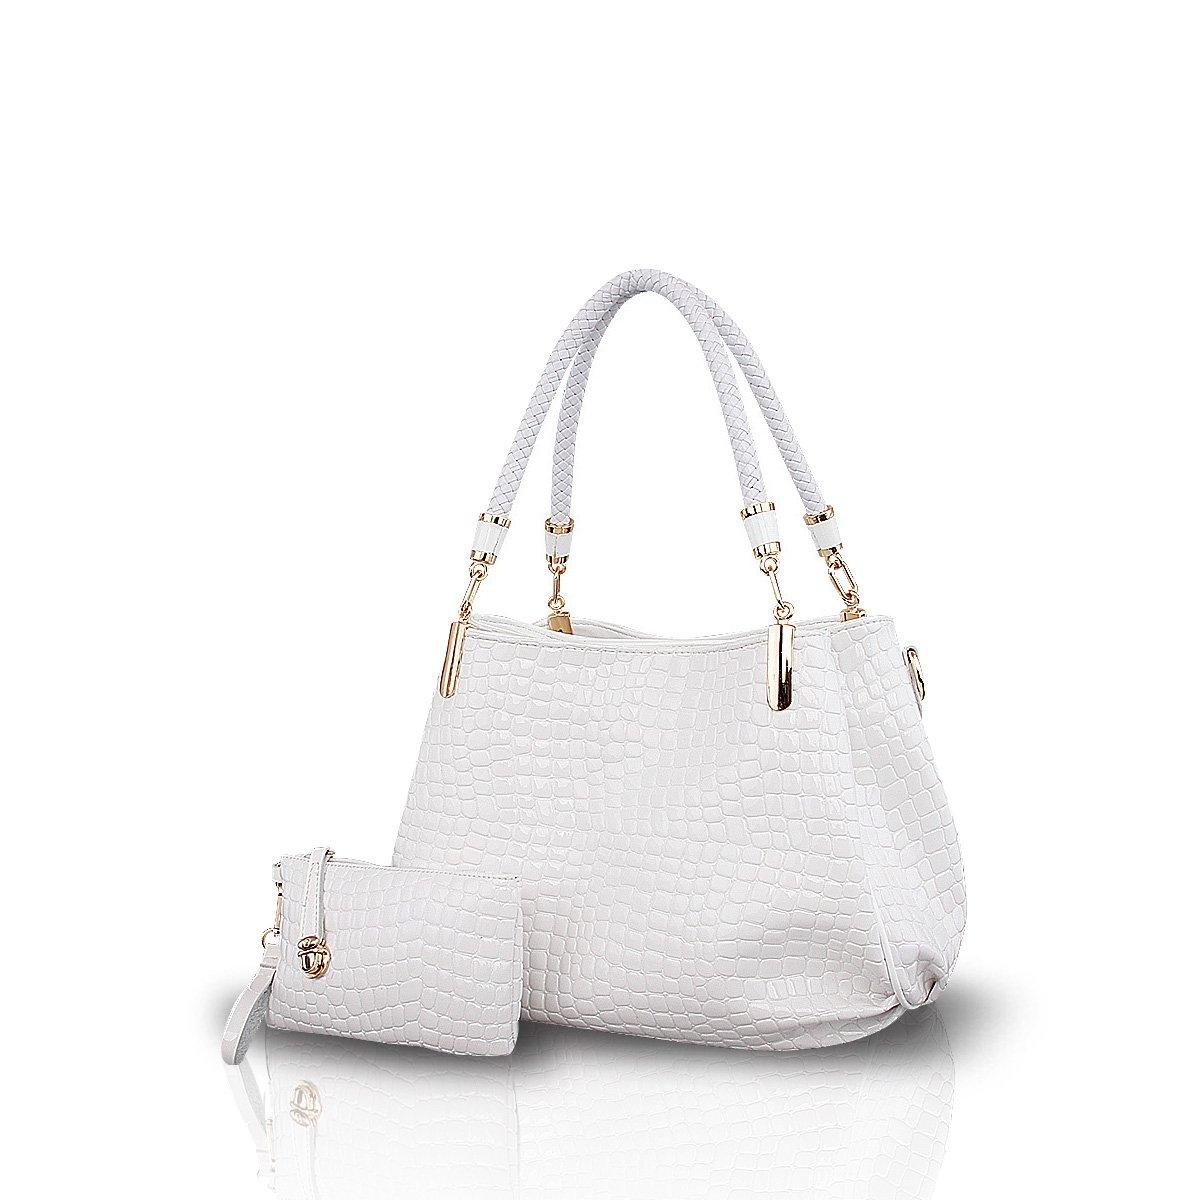 NICOLE&DORIS New Crocodile Grain PU Leather Women/Ladies Shoulder Bag Handbag Crossbody Totes Large Bag White